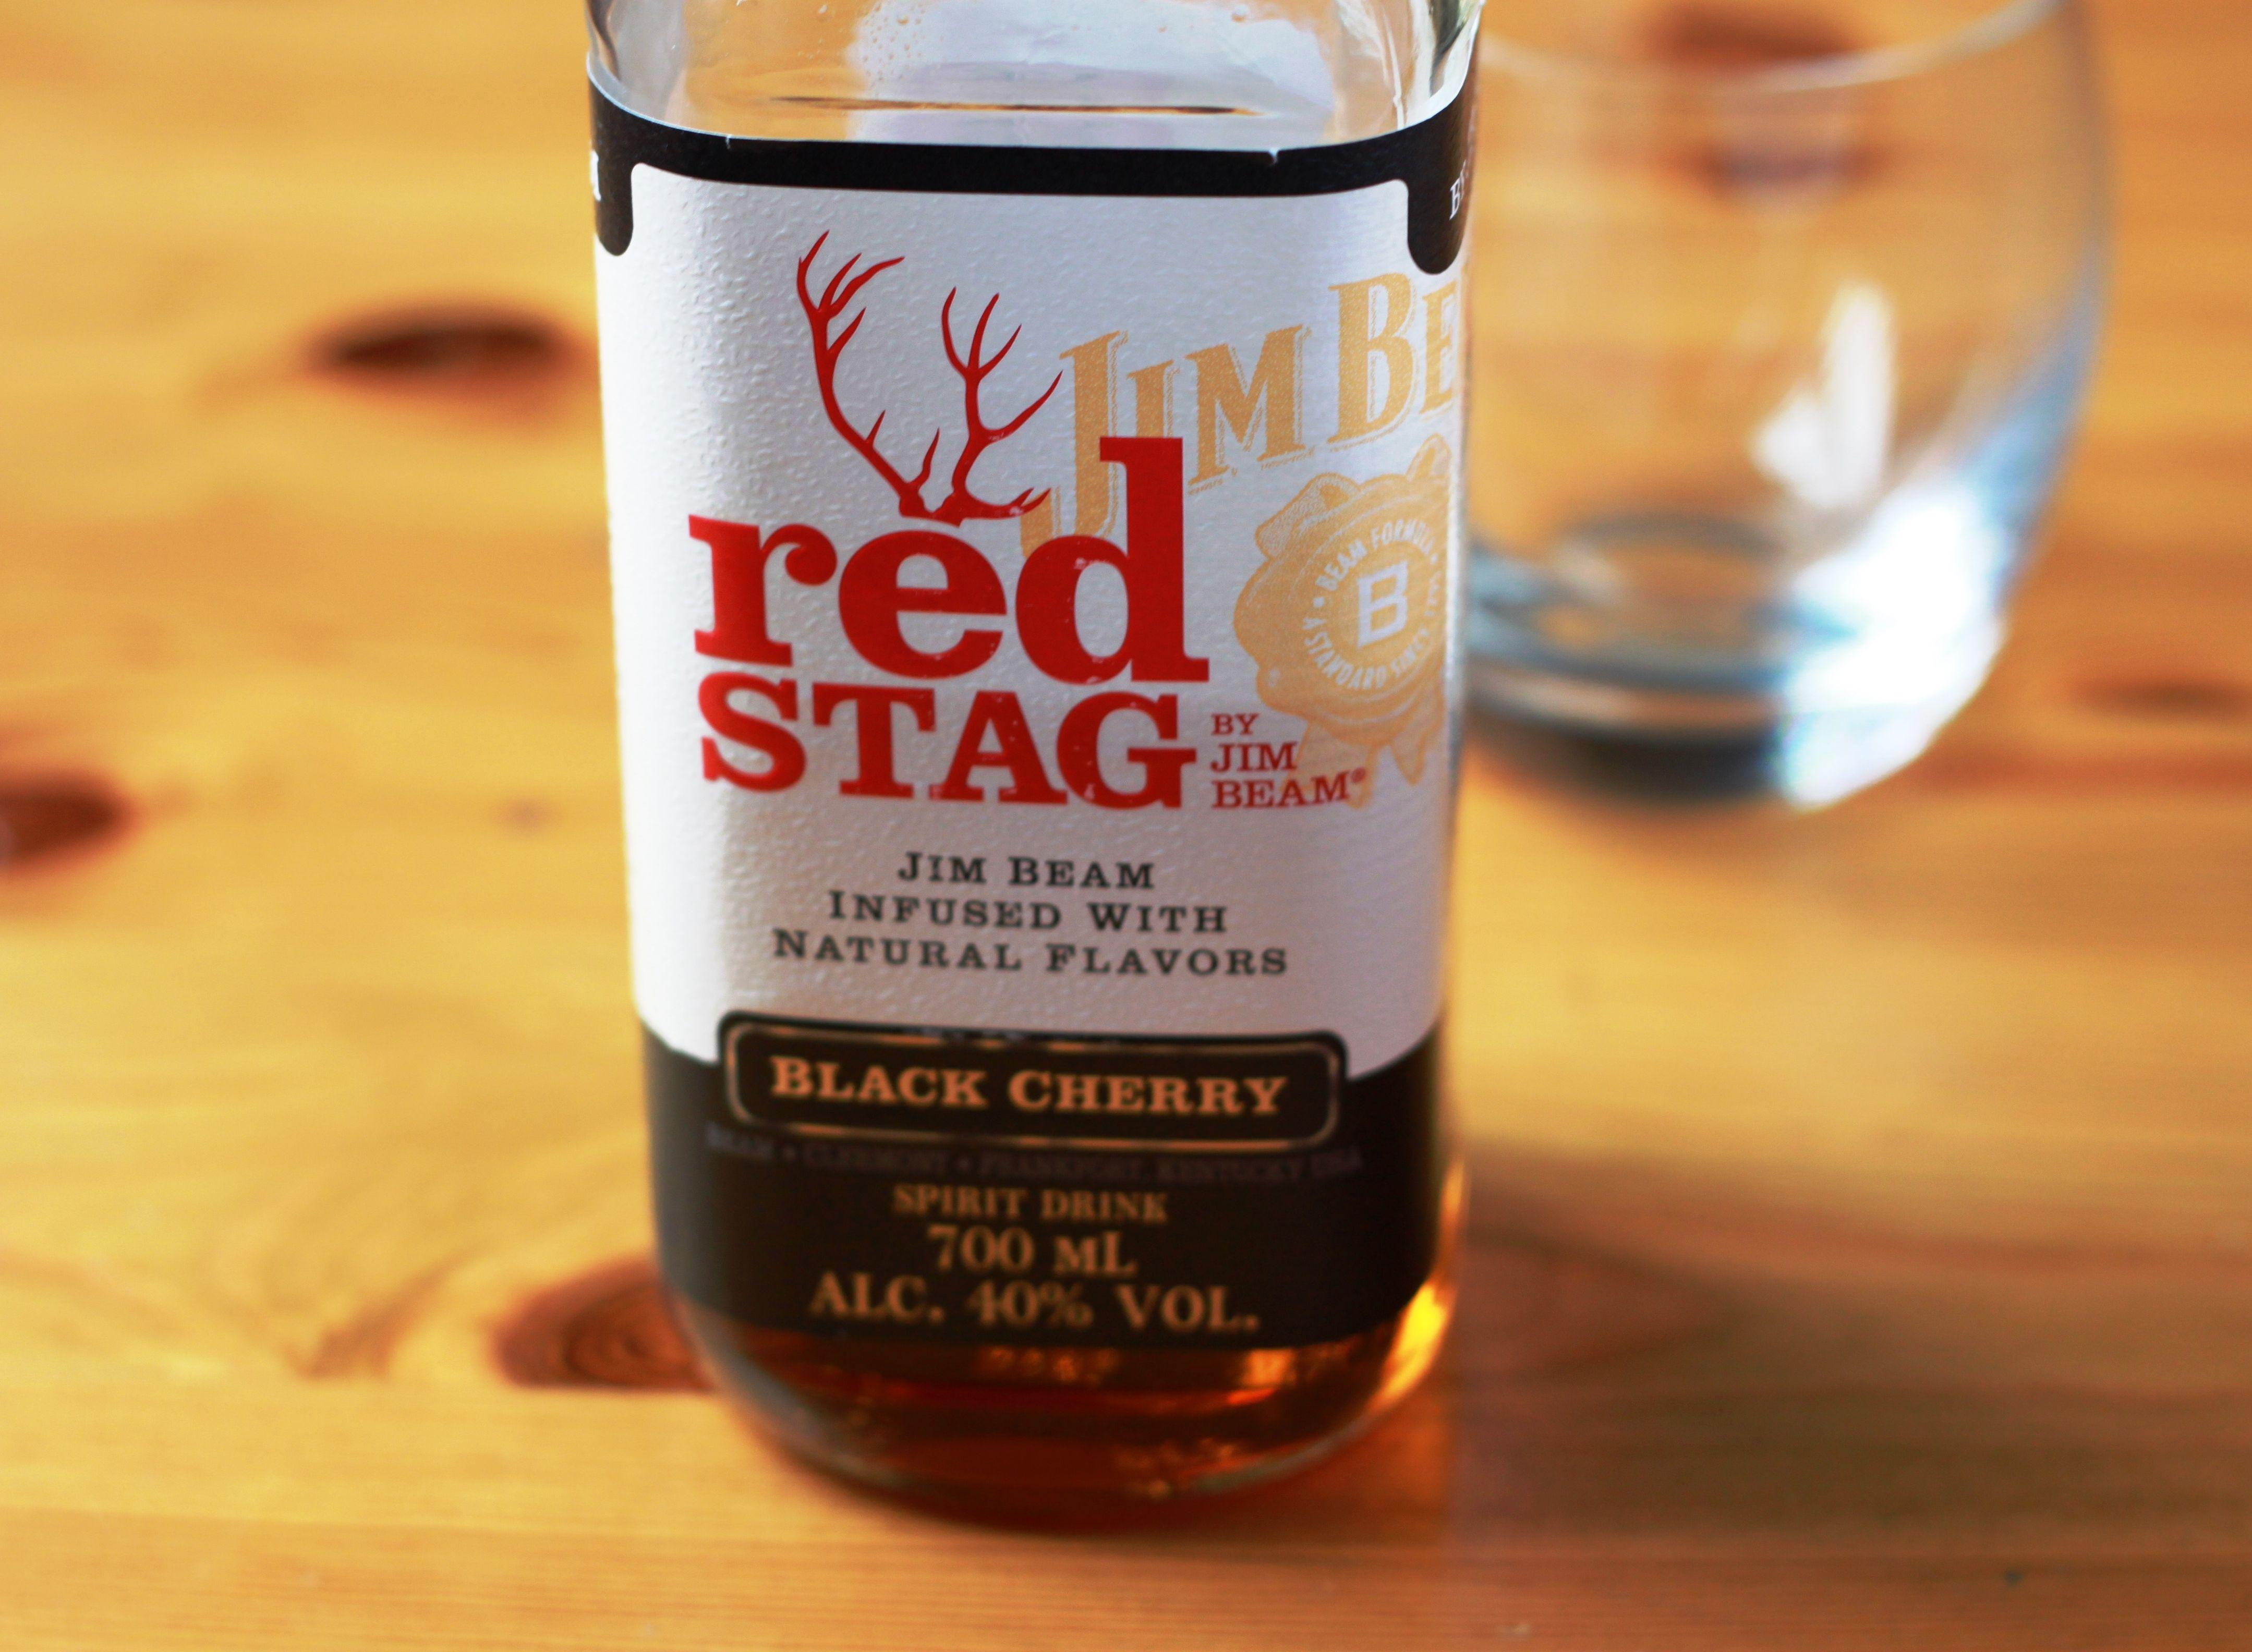 Whisky Review Jim Beam Red Stag Jim Beam Whisky Liquor Bar